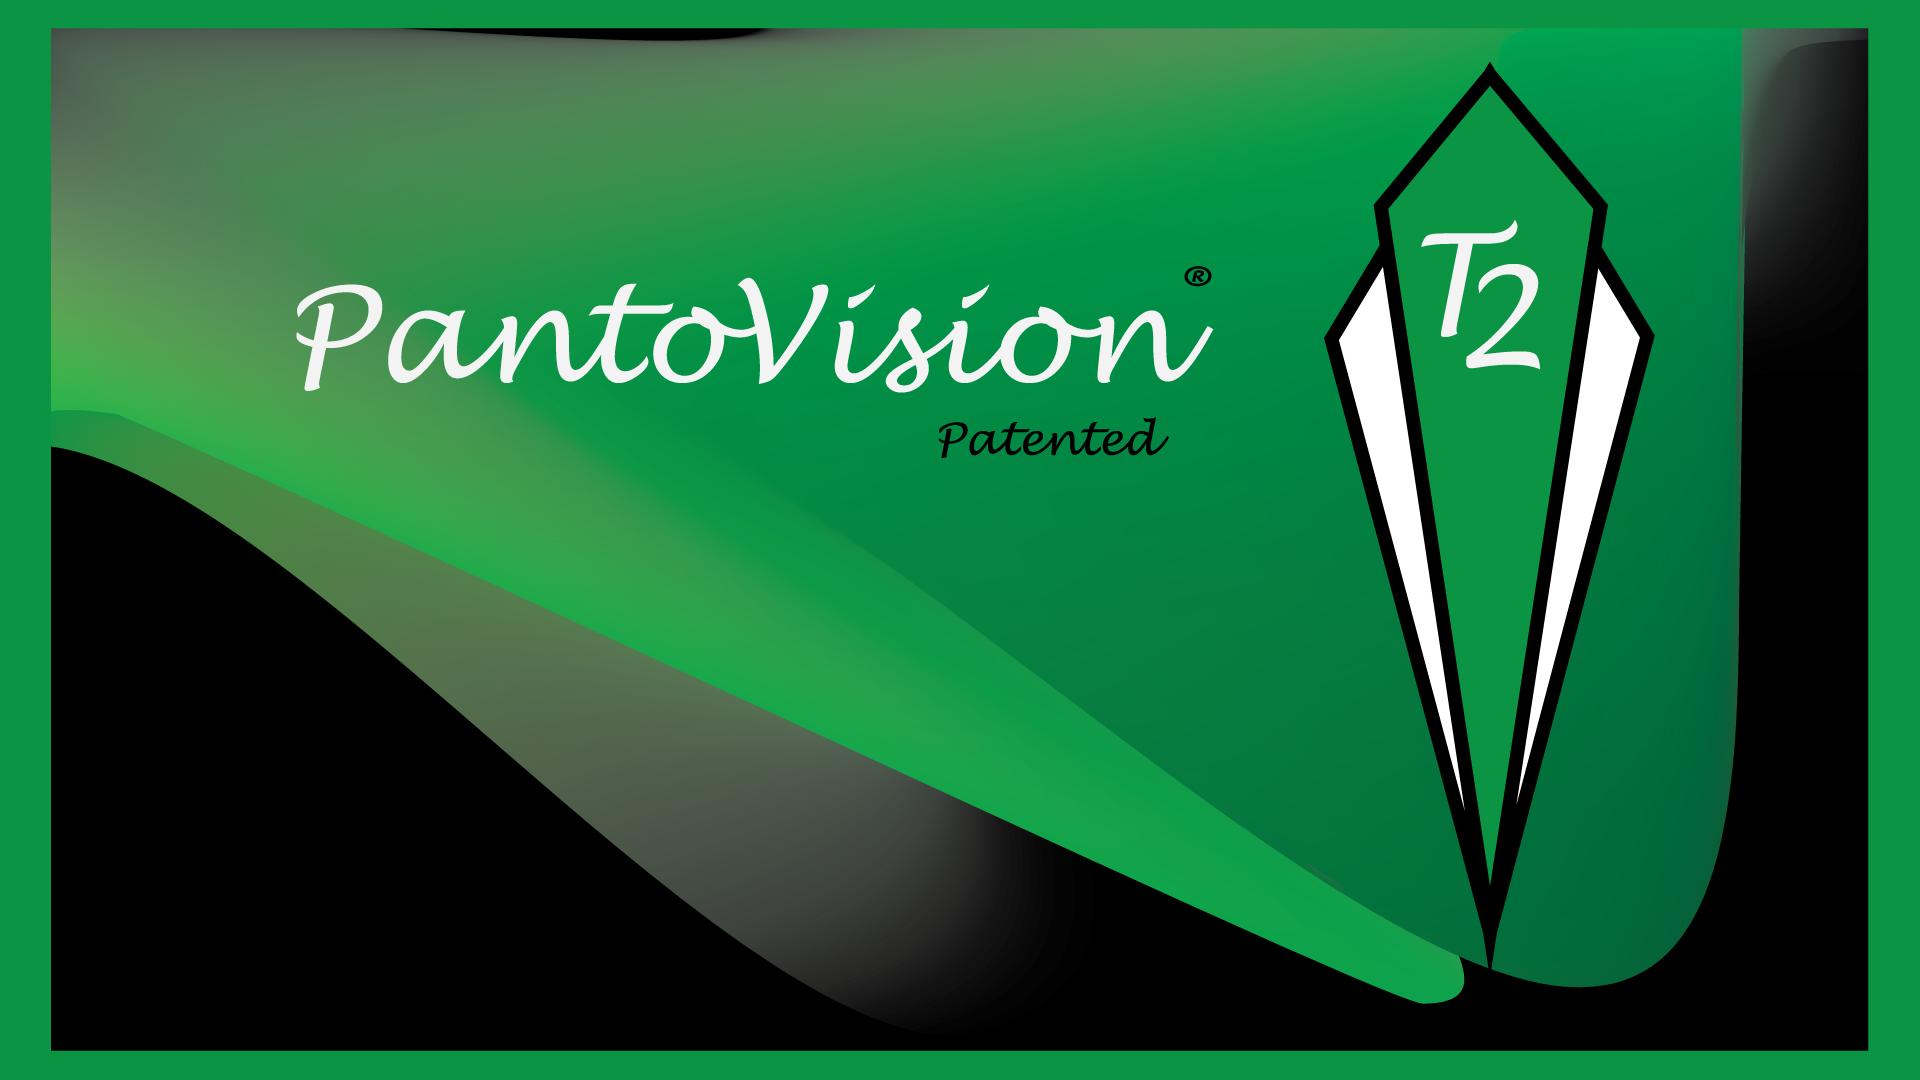 PantoVision Digital Pantograph Guidance System